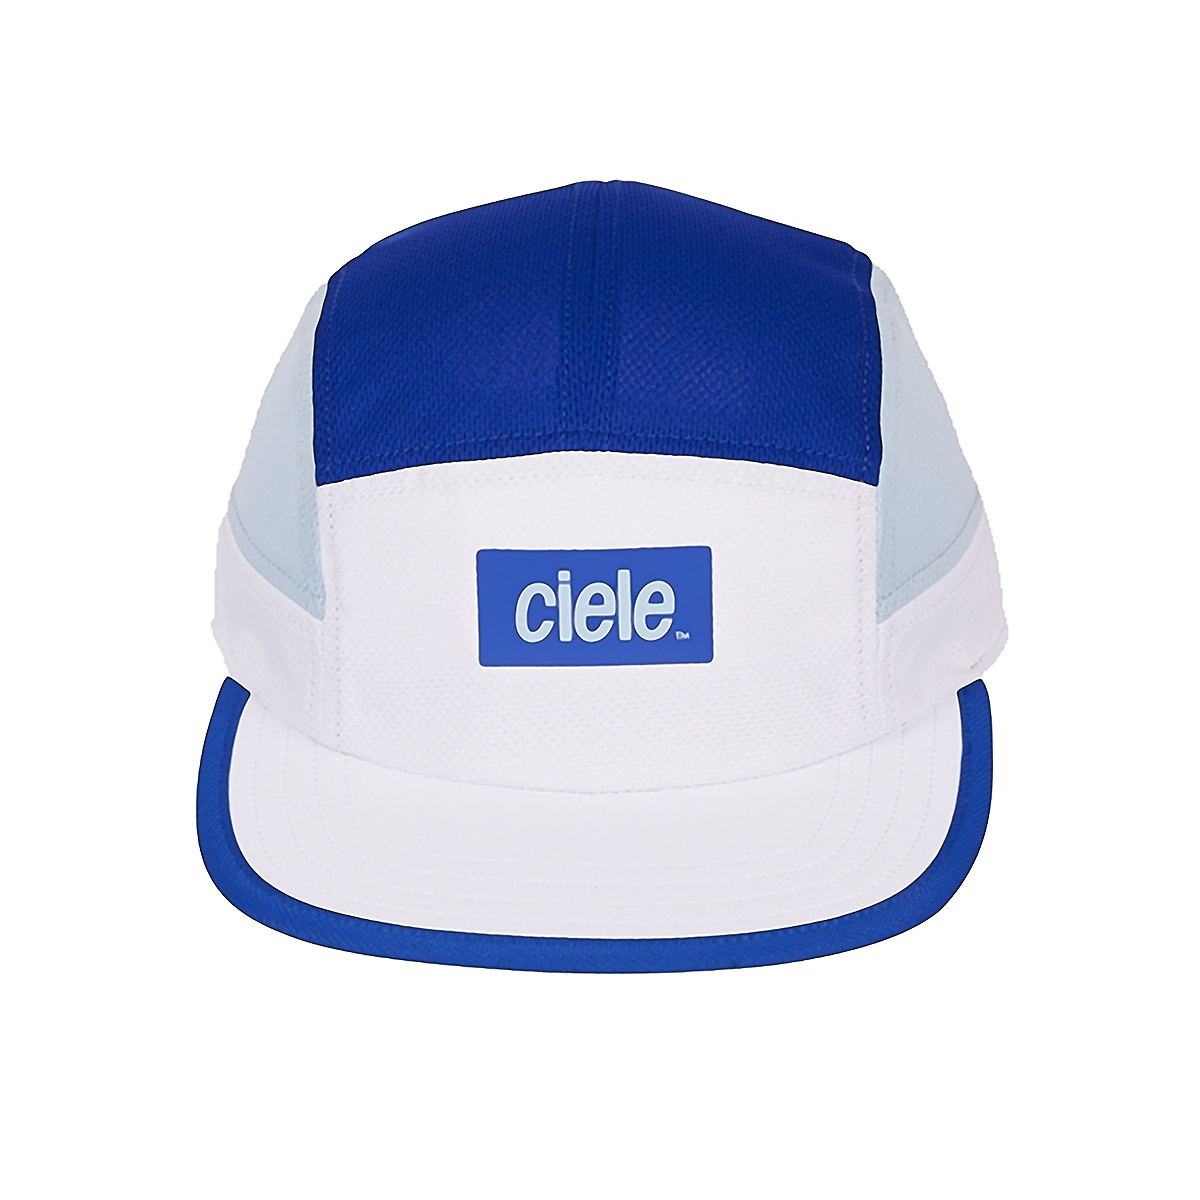 Ciele Athletics GOCap Standard Grip - Color: Victory - Size: OS, Victory, large, image 1